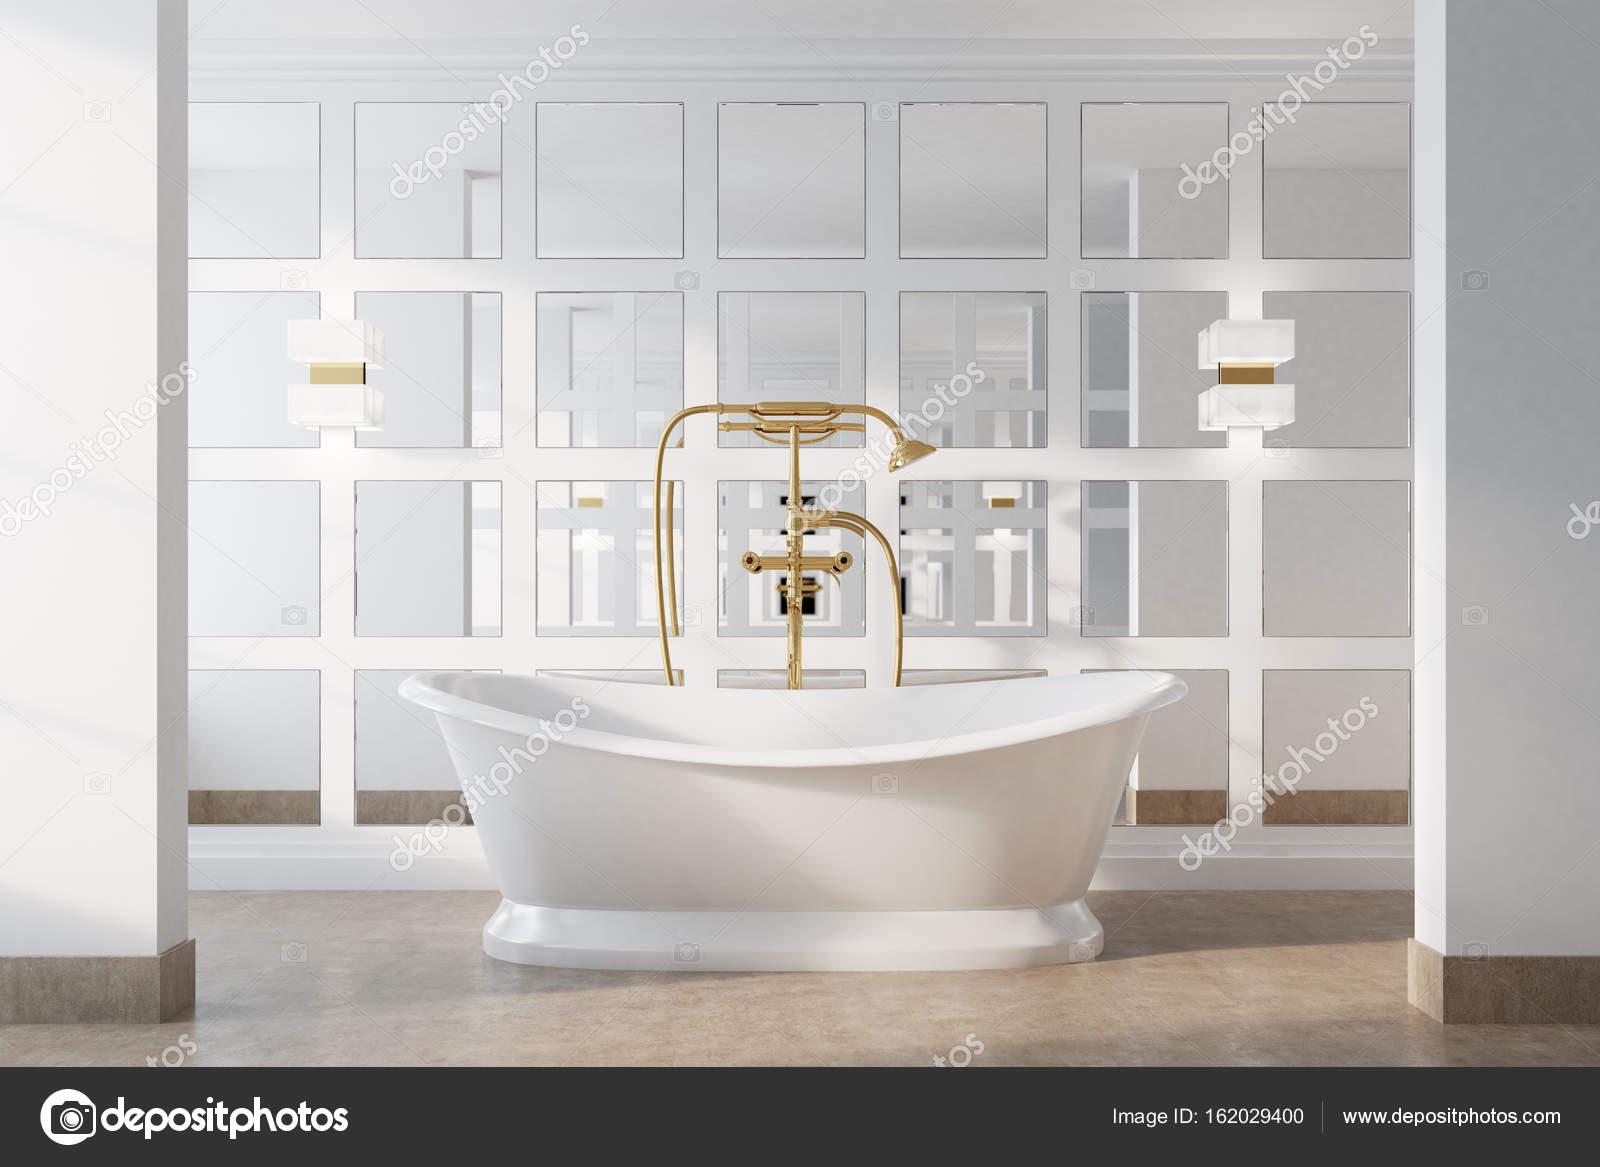 Vintage Bad, weiße Wanne — Stockfoto © denisismagilov #162029400